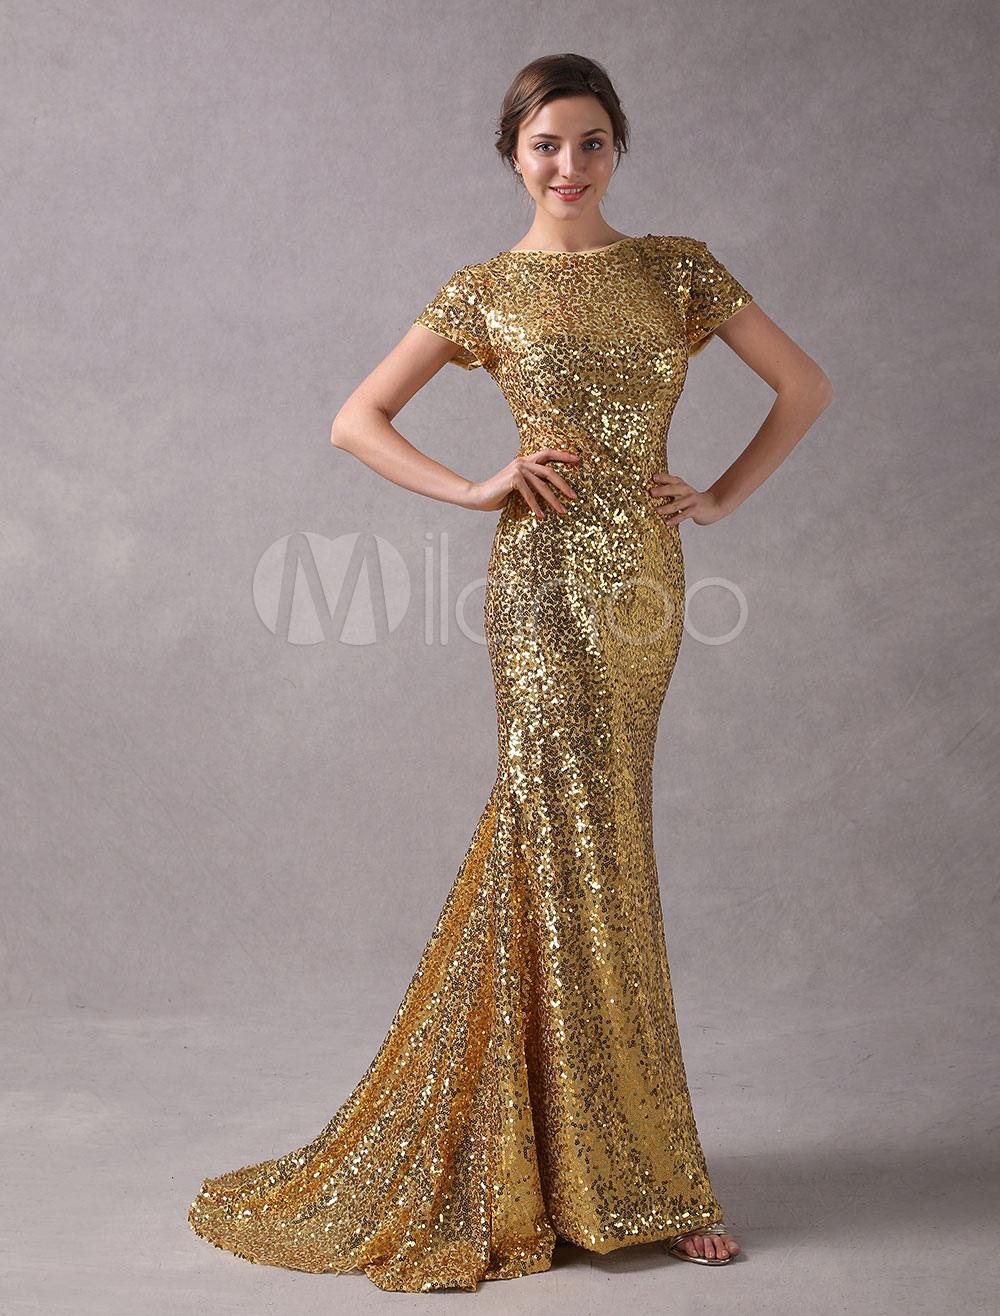 a884a10e7 Sequin party dress with long sleeves, gold sequin evening dress, cheap  sequin dress, long sleeve sparkle dress | Milanoo.com